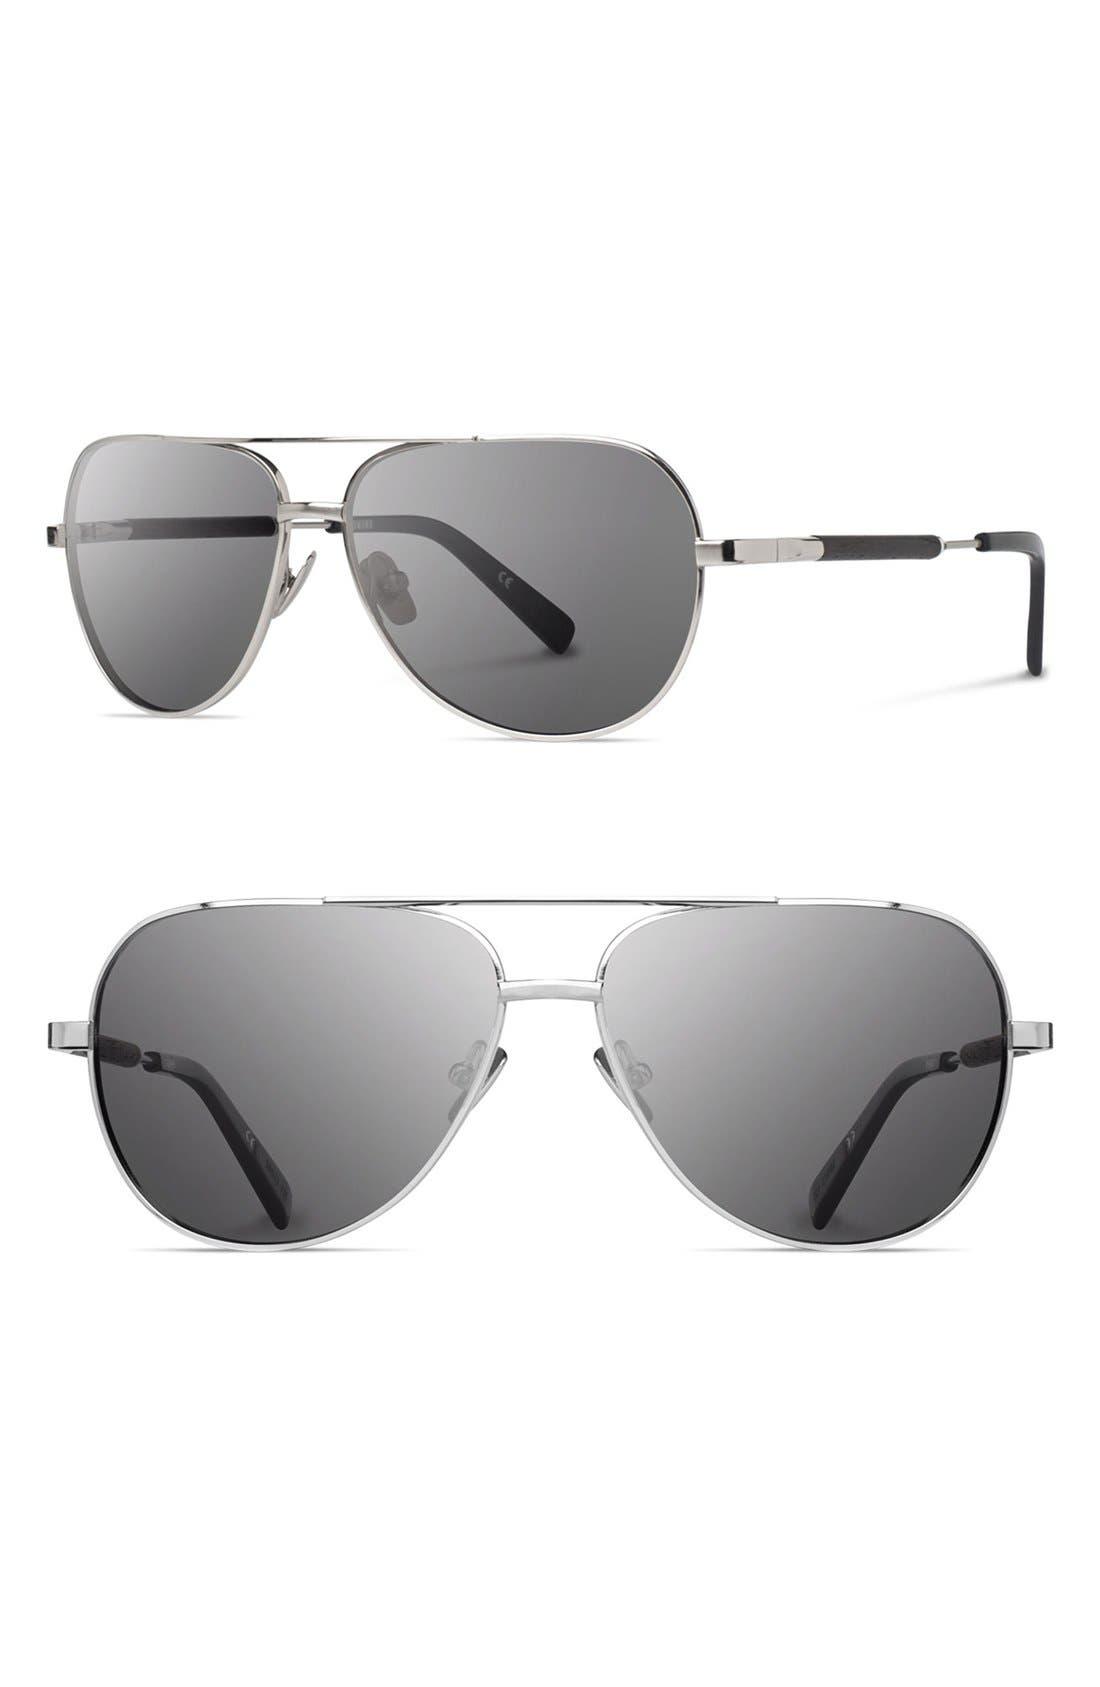 Alternate Image 1 Selected - Shwood 'Redmond' 53mm Titanium & Wood Aviator Sunglasses